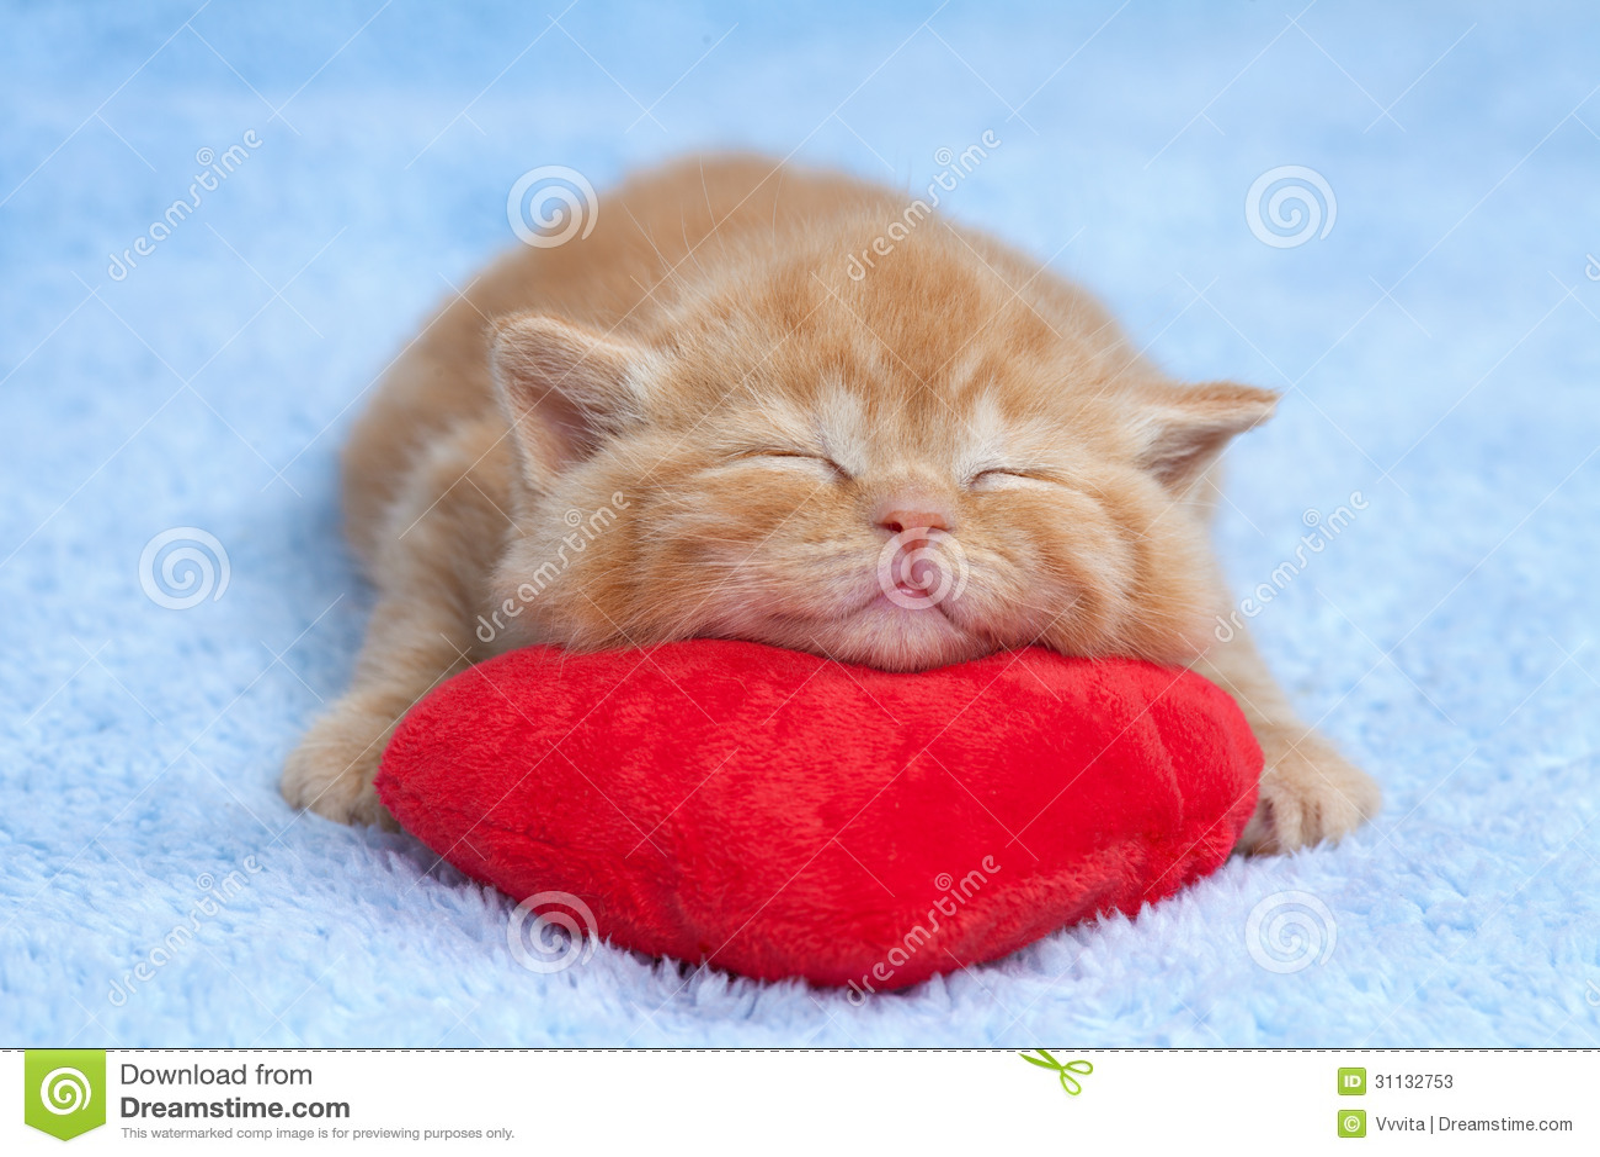 Little cat sleeping on the pillow